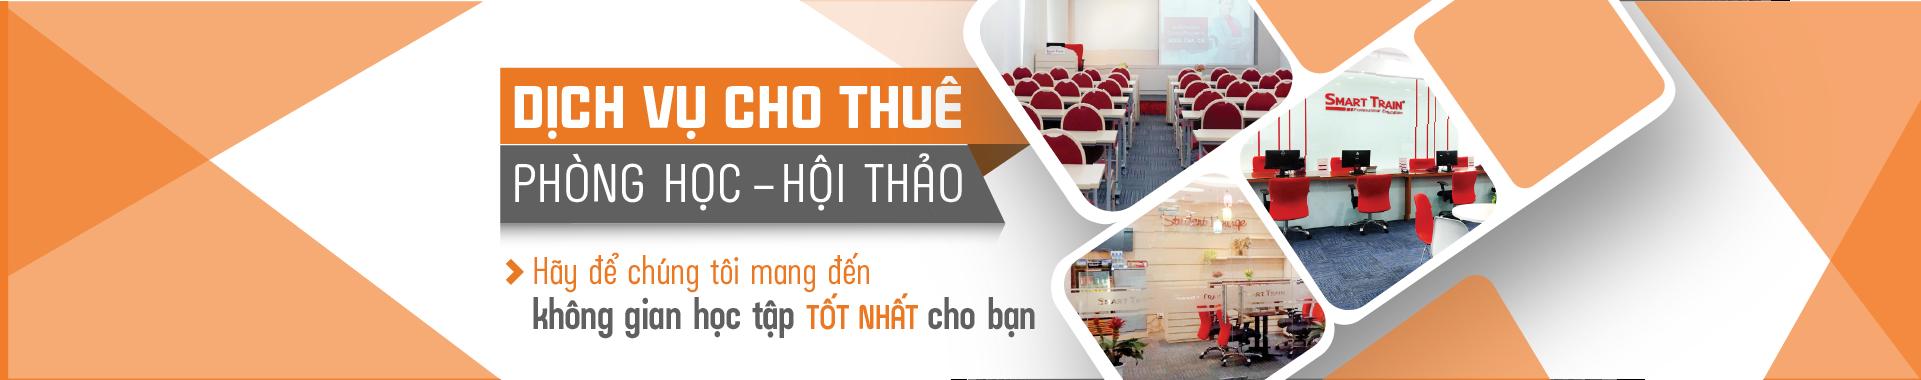 Banner DV thue phong-02